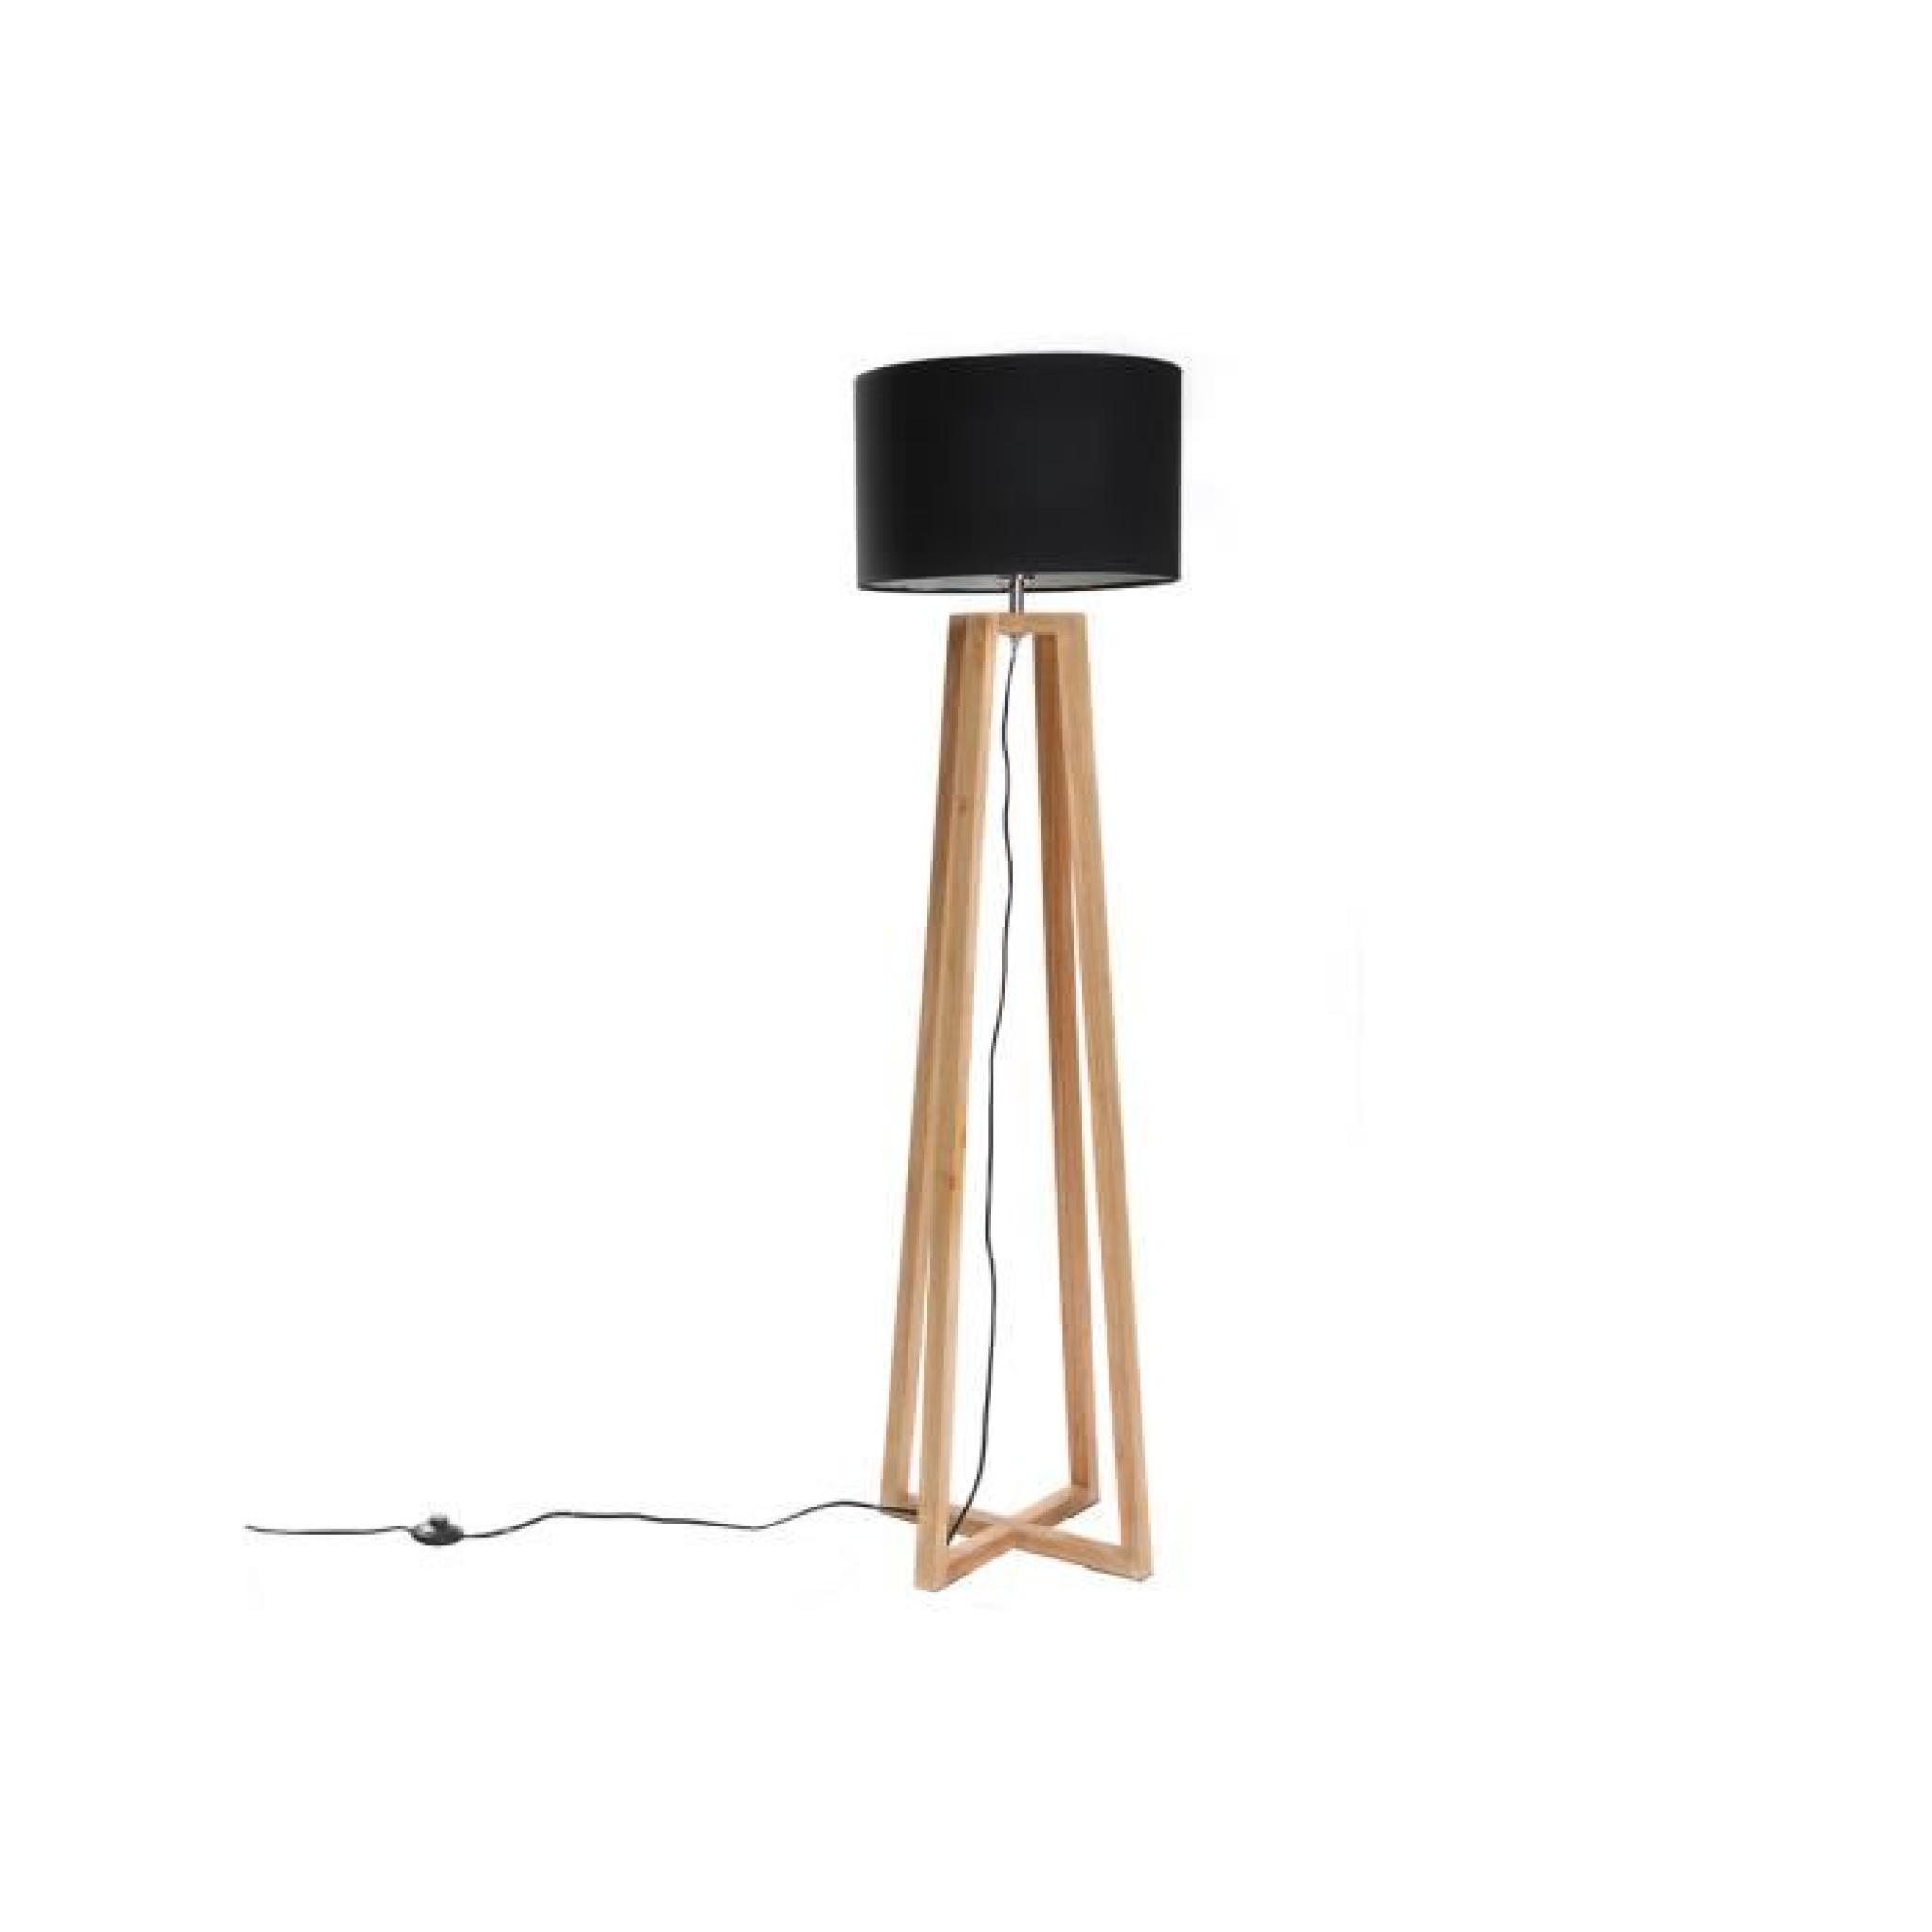 lampadaire scandinave noir norda achat vente lampadaire. Black Bedroom Furniture Sets. Home Design Ideas